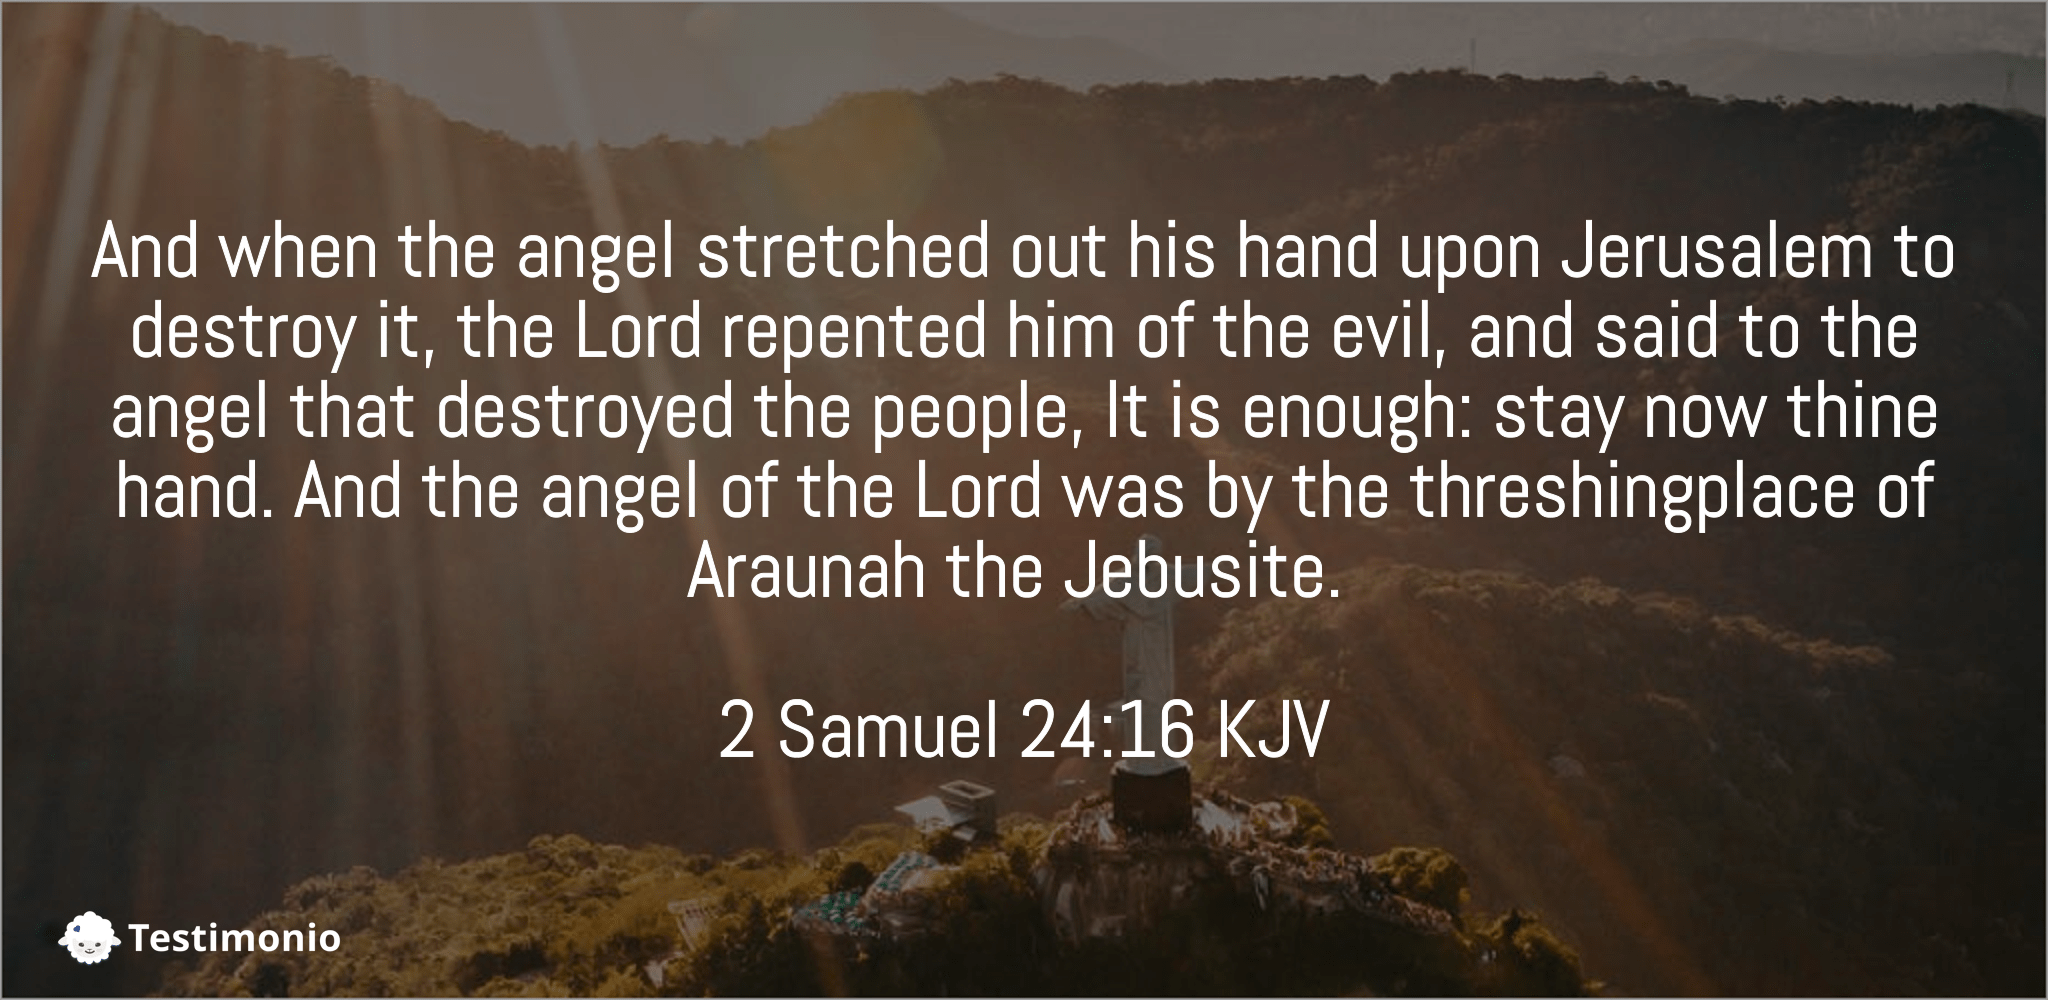 2 Samuel 24:16